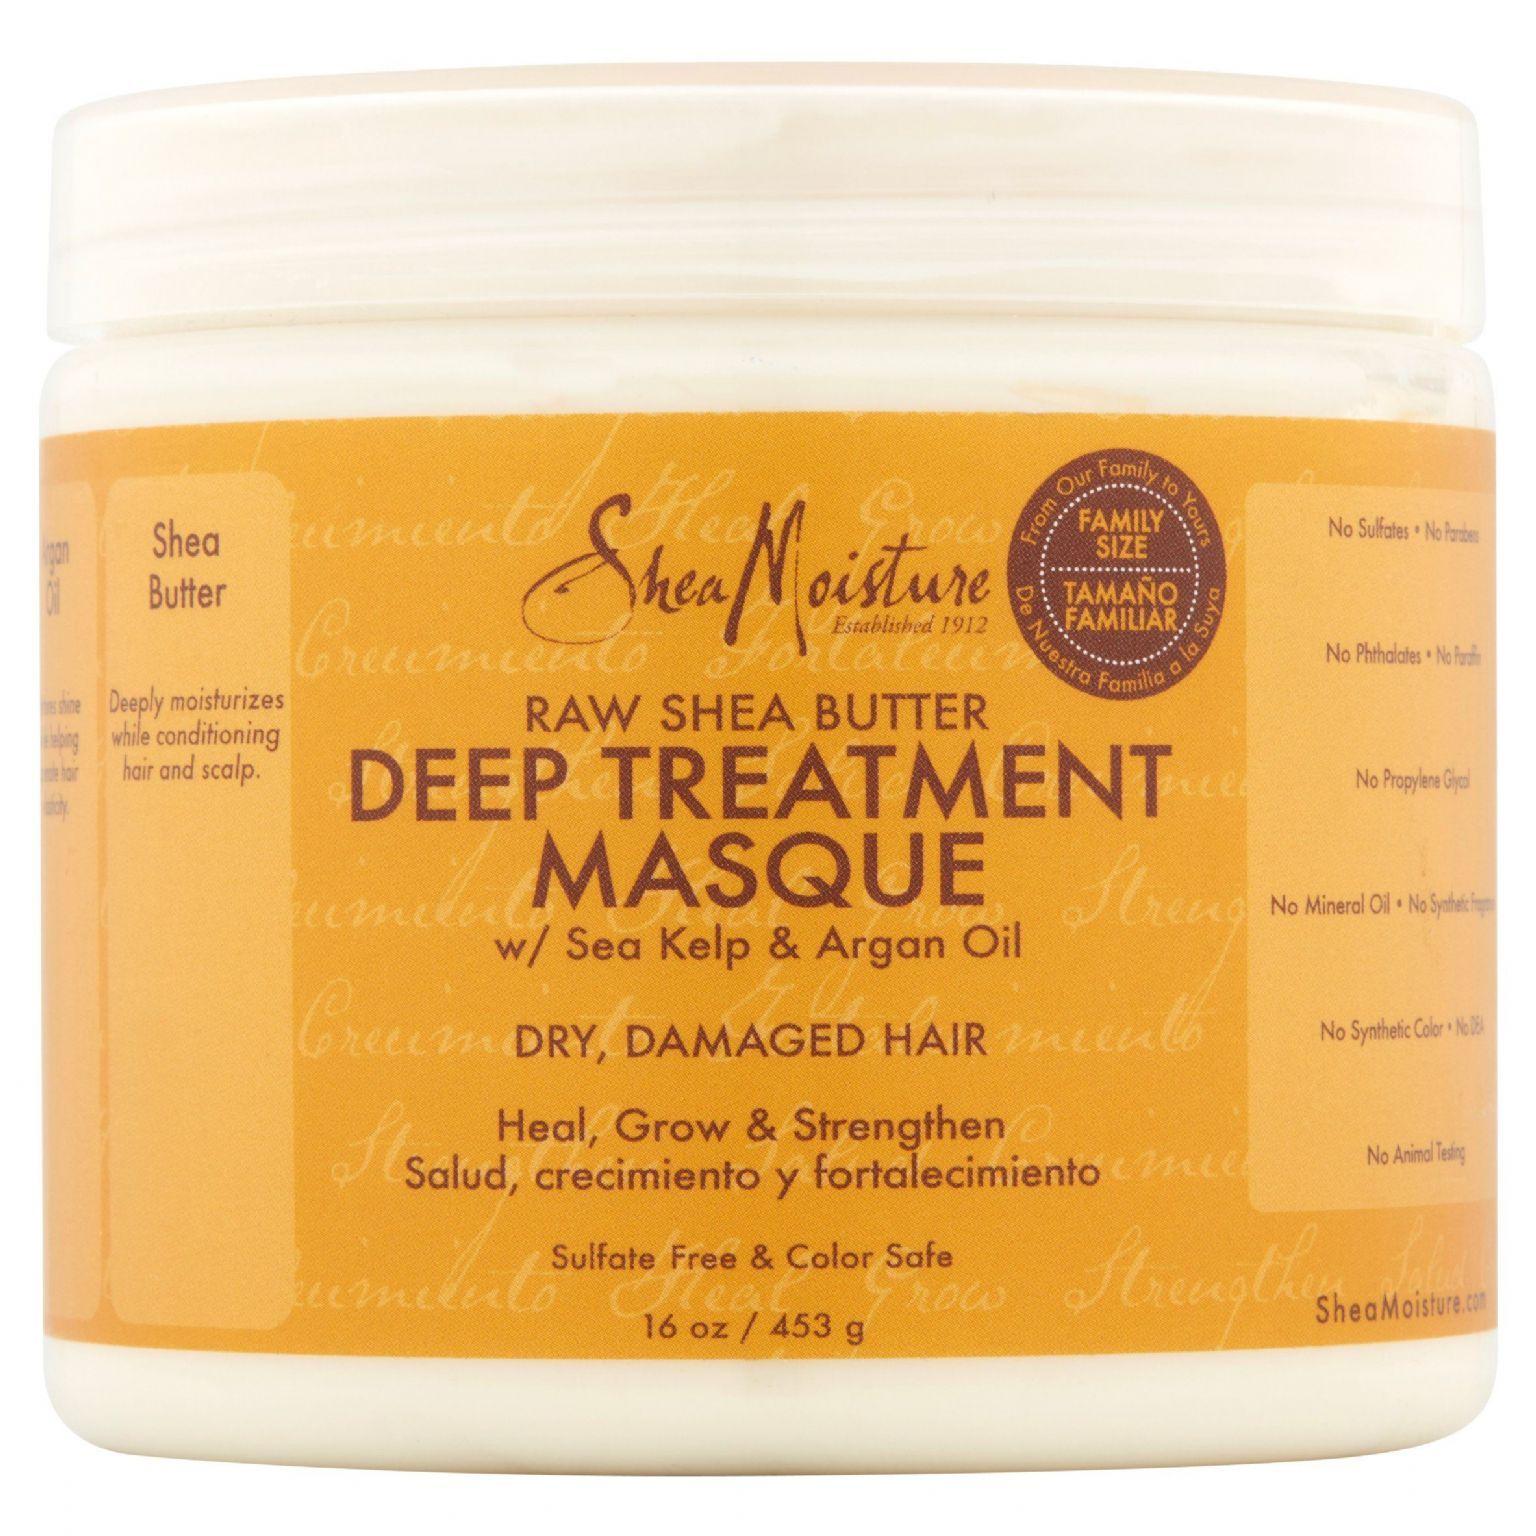 Raw Shea Butter Deep Treatment Masque with Sea Kelp & Argan Oil